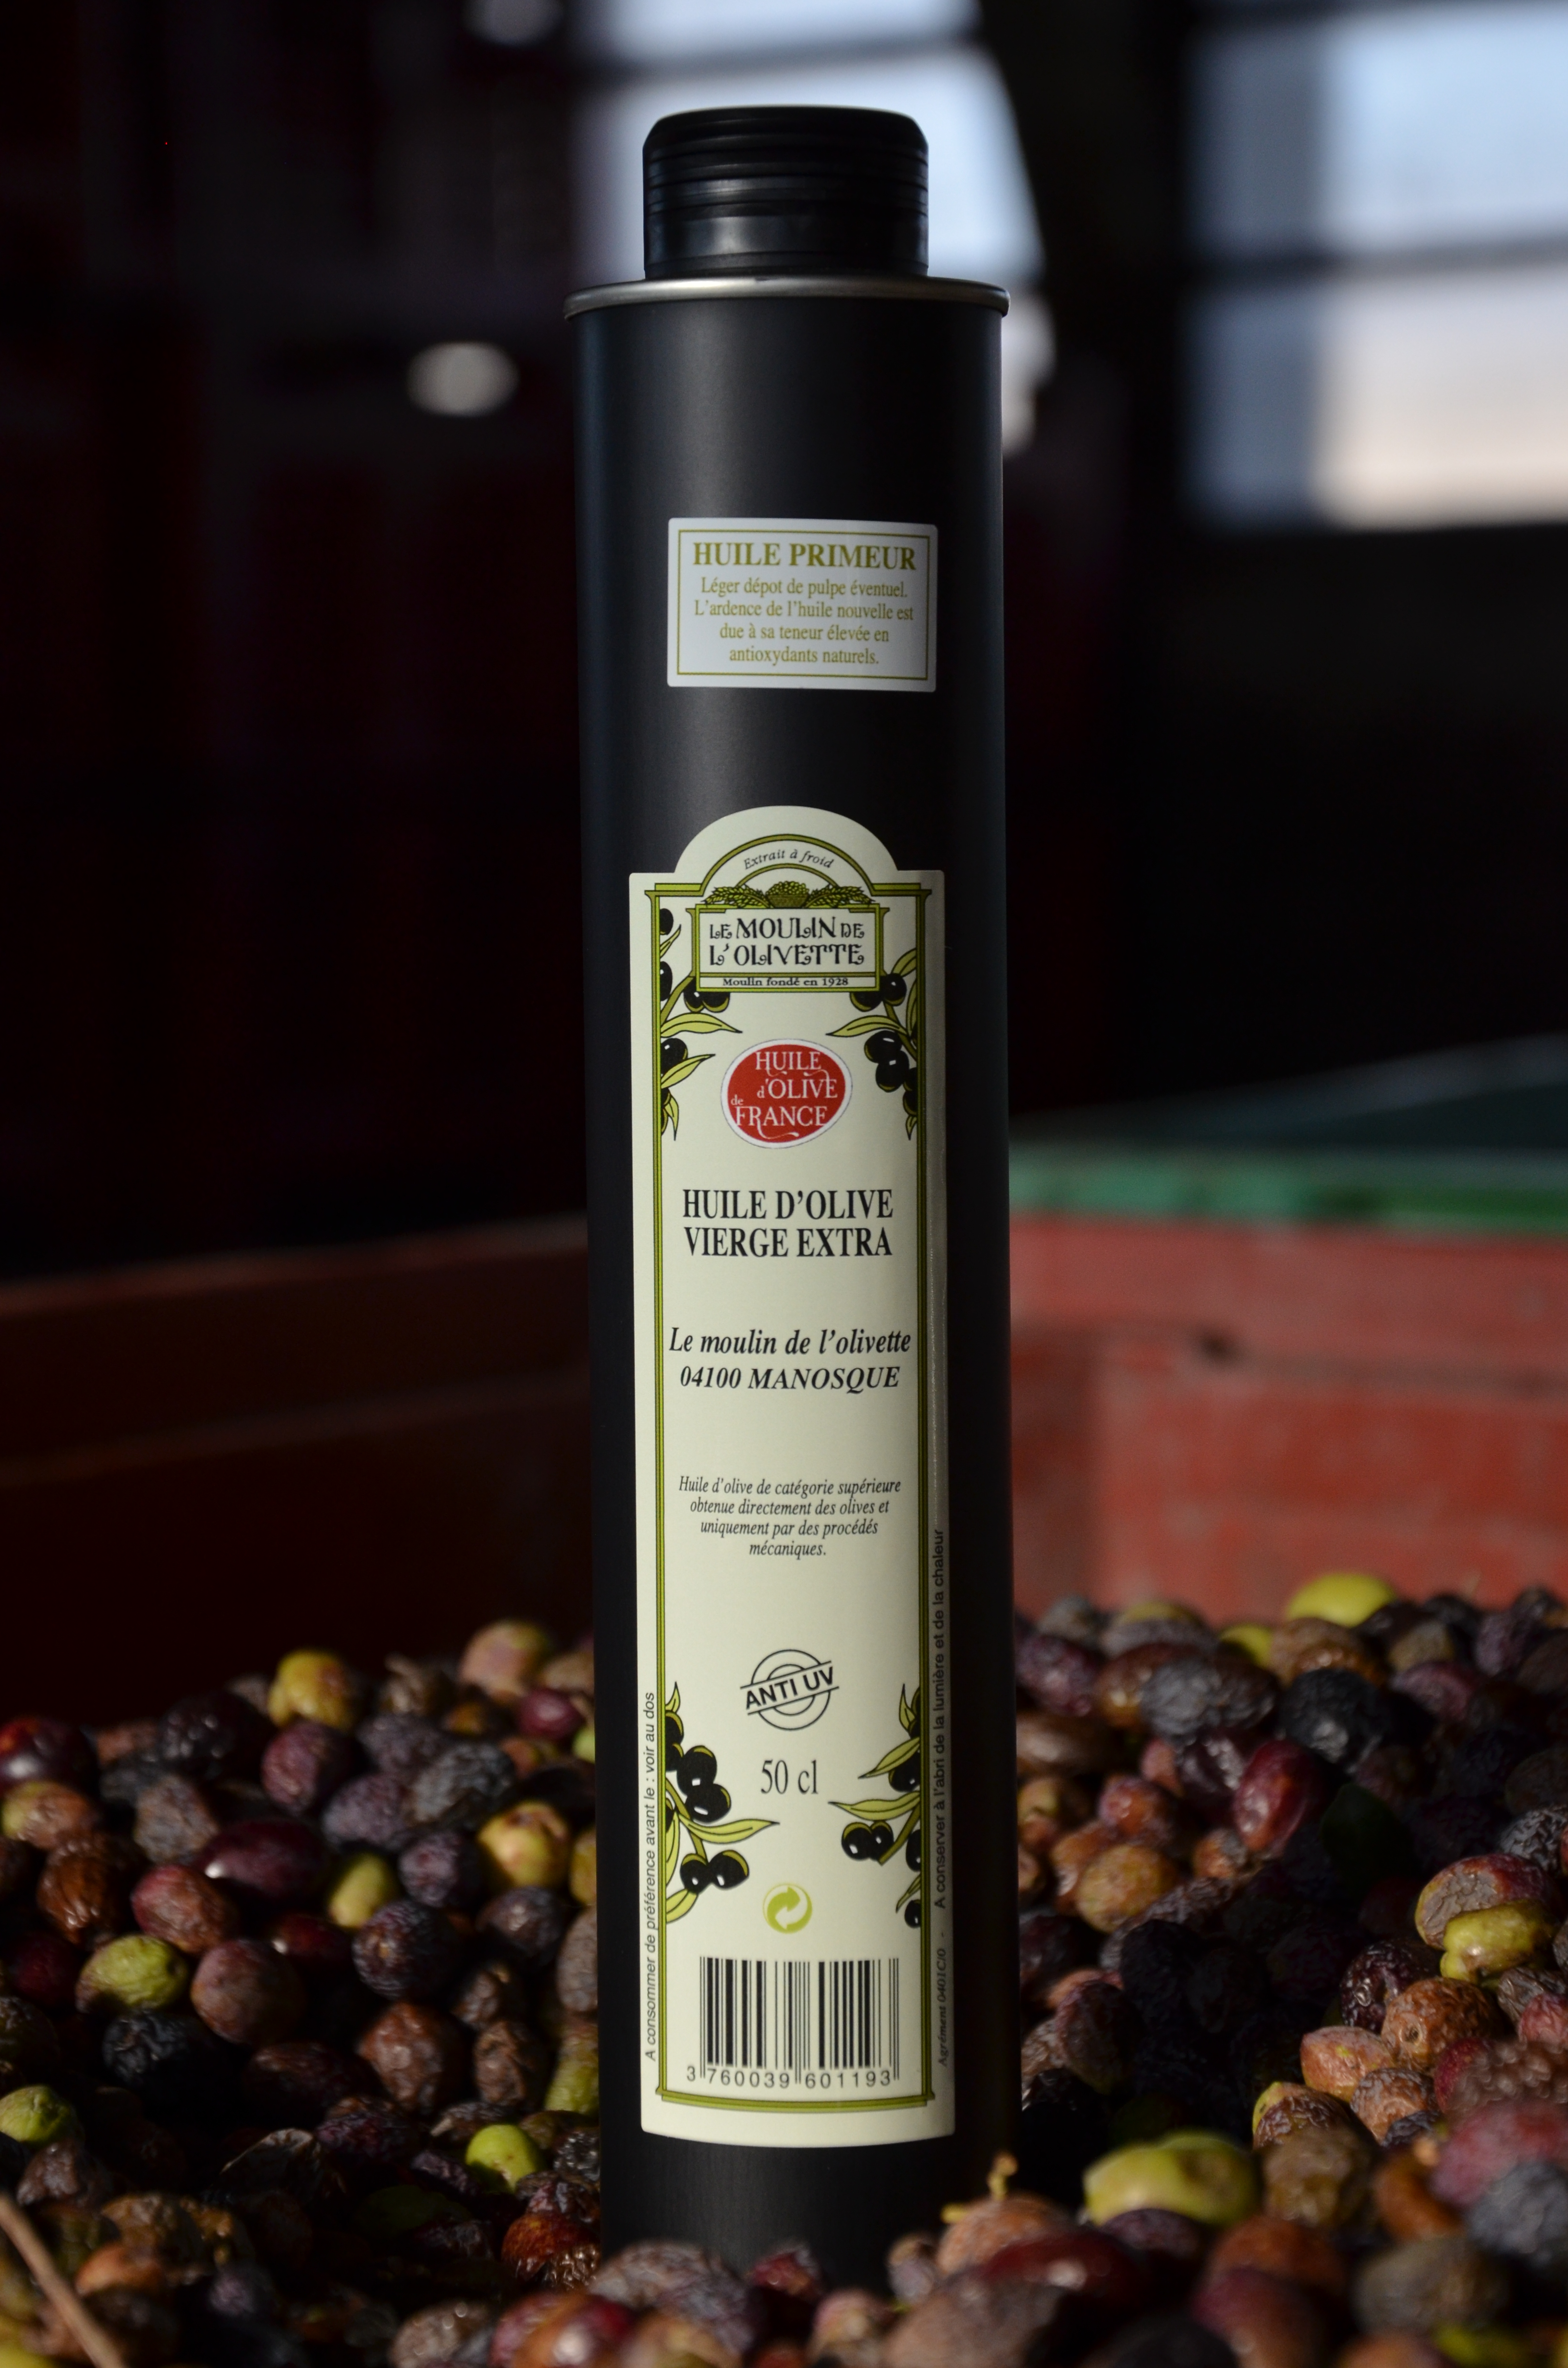 huile d 39 olive v extra du midi de la france 0 5l huile d 39 olive de provence aoc en vente directe. Black Bedroom Furniture Sets. Home Design Ideas